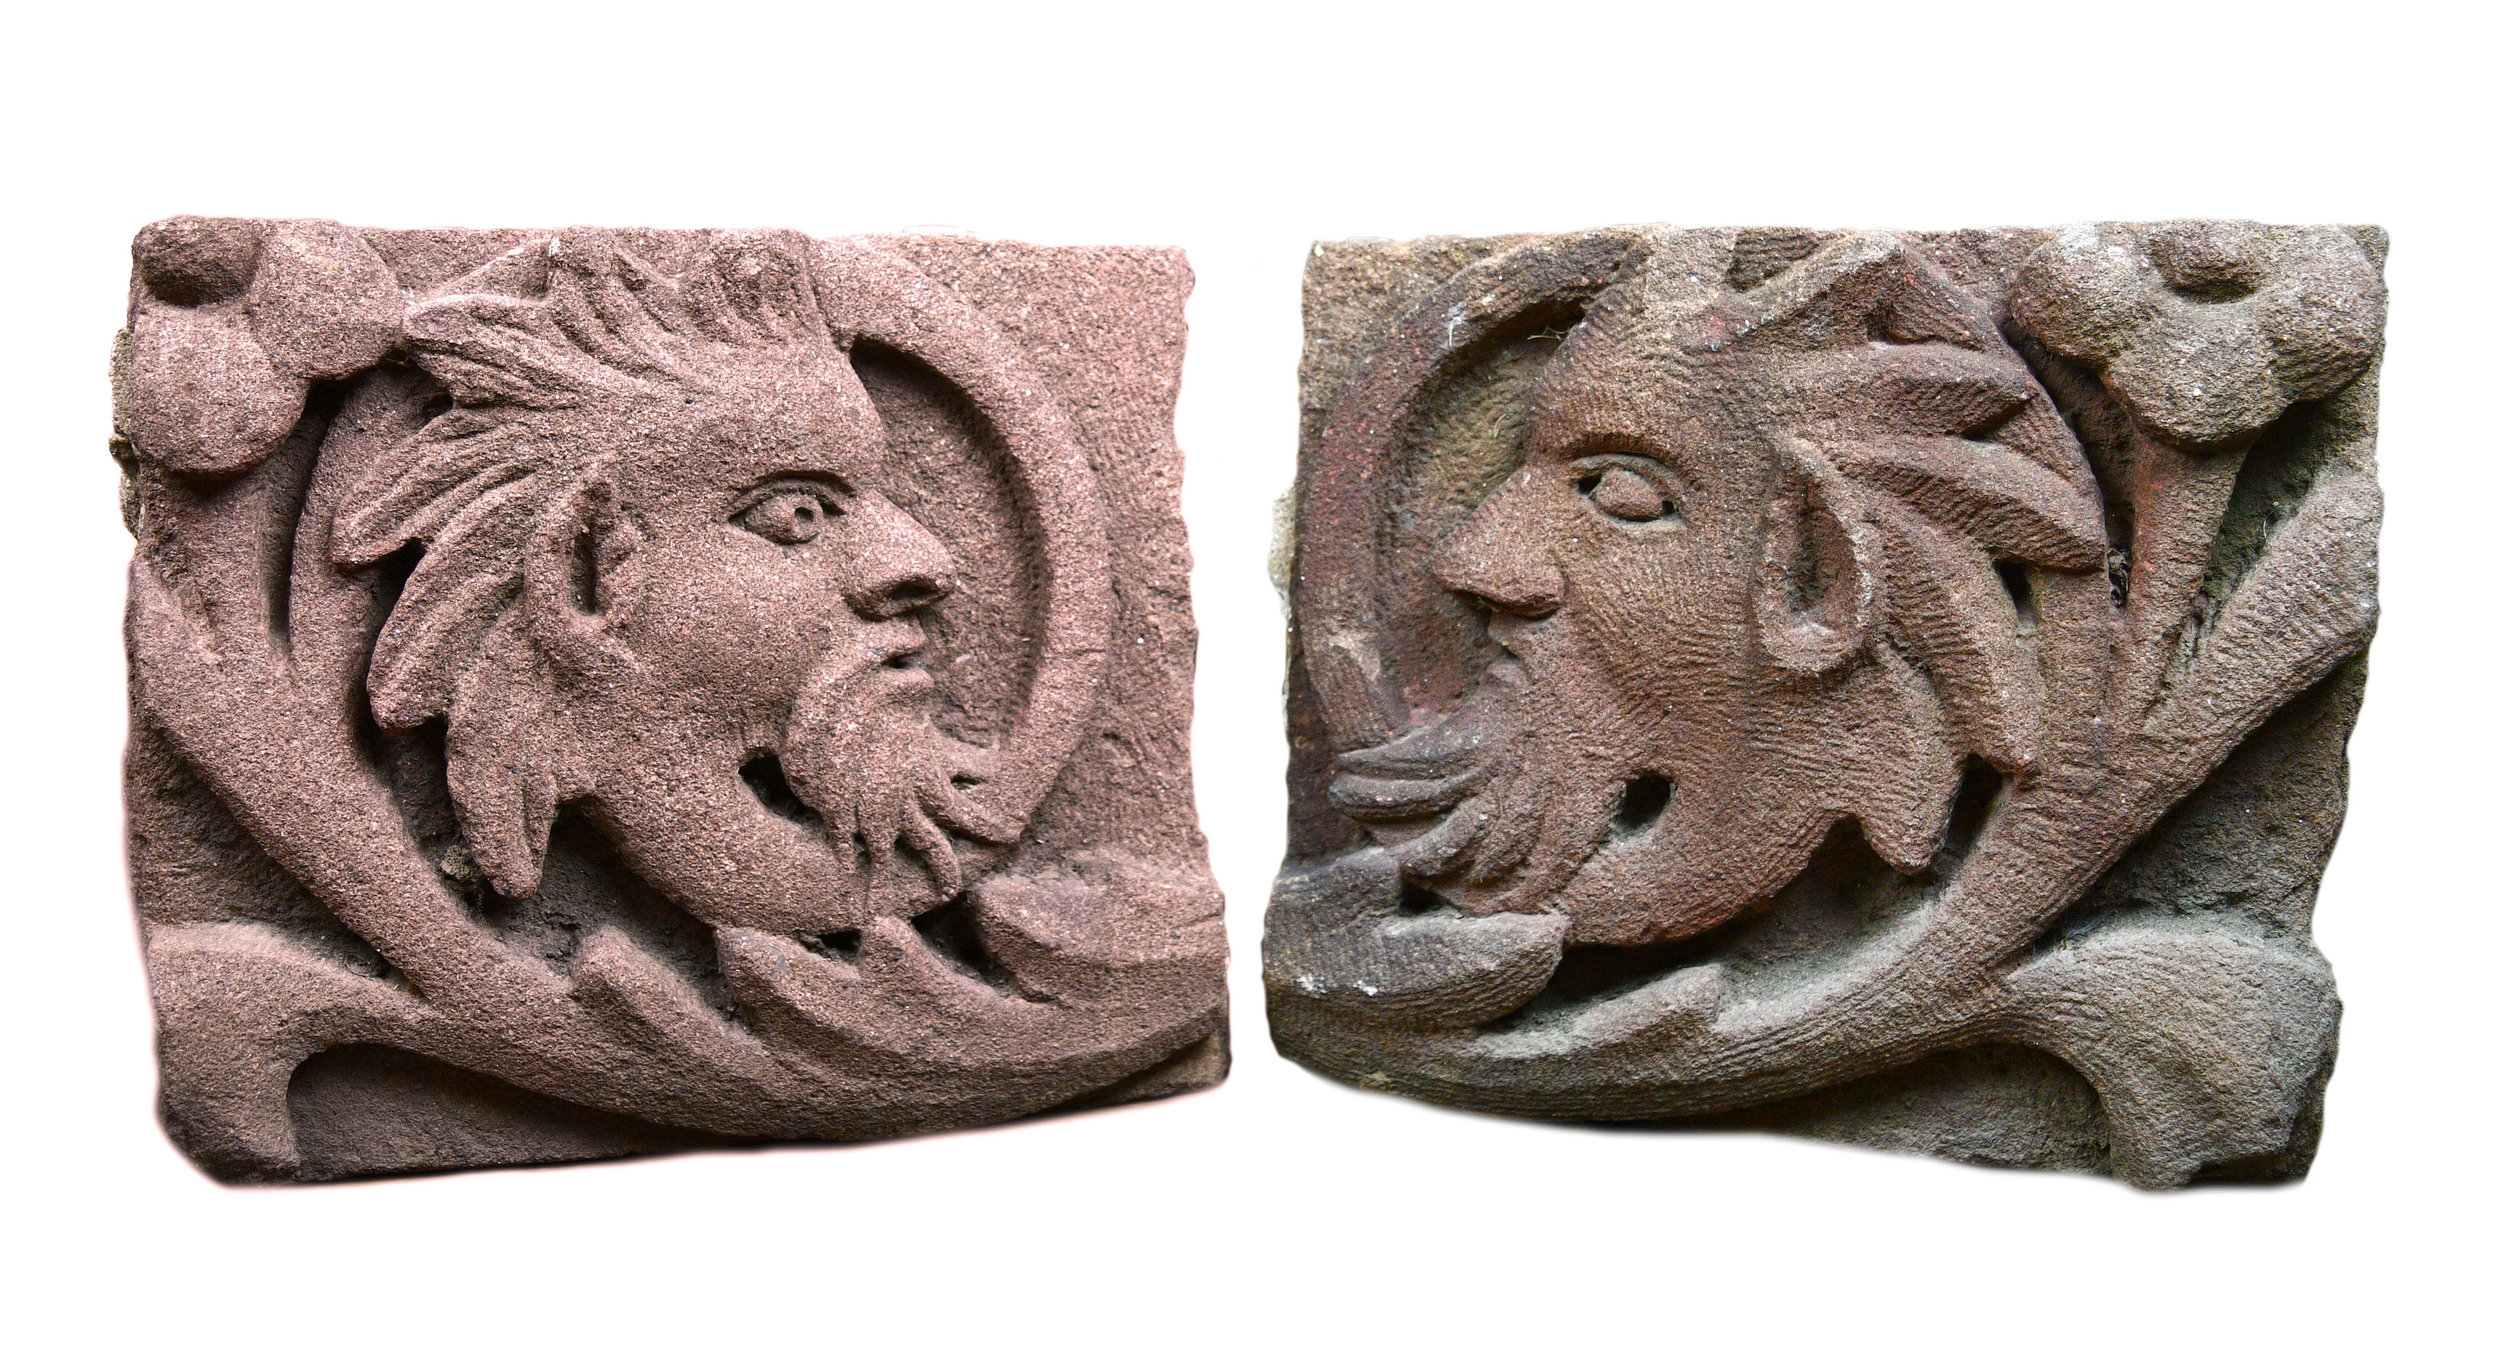 48436-sandstone-faces-2.jpg